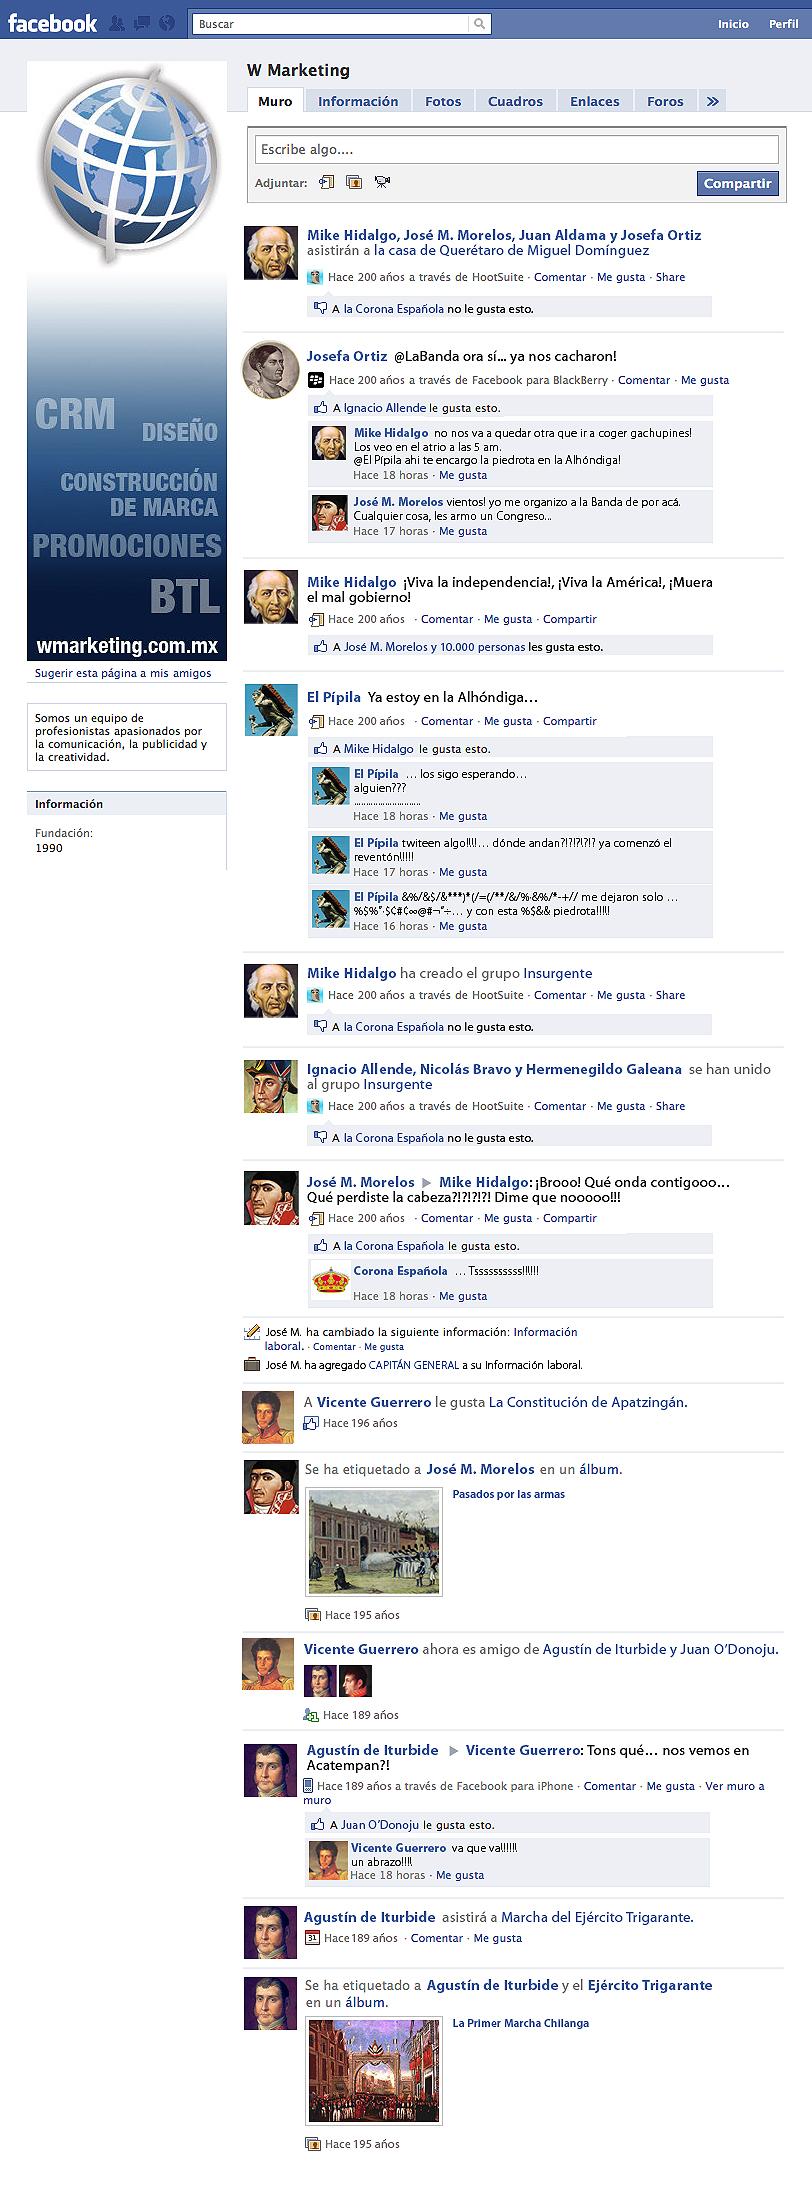 FB bicentenario.jpg